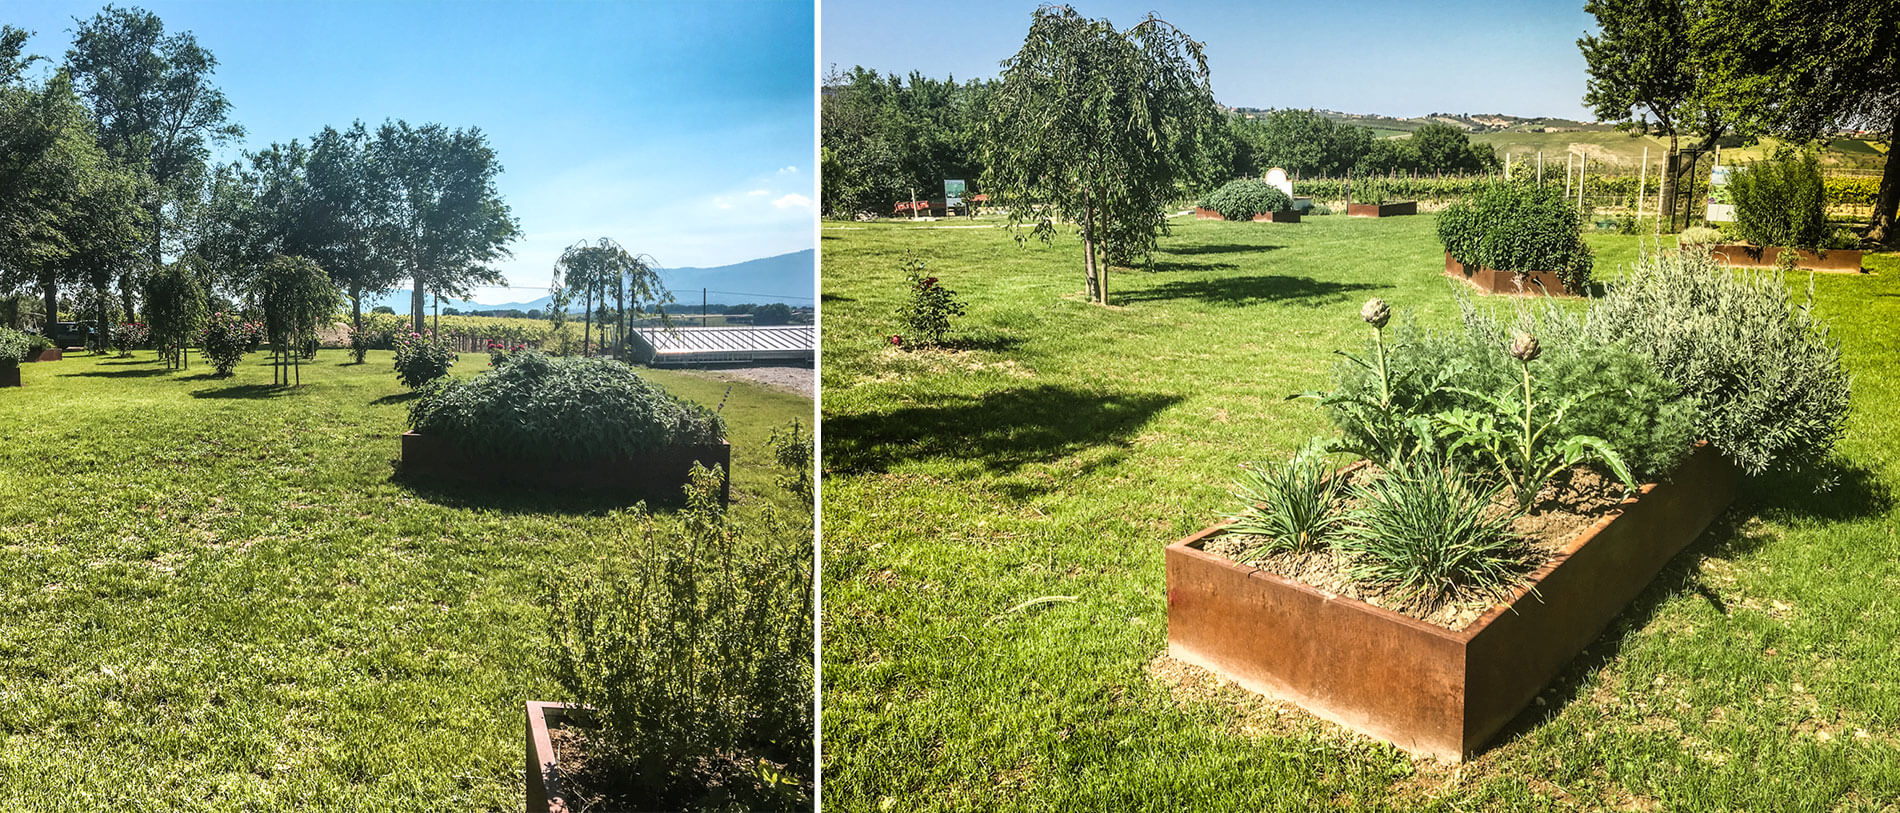 bordure-giardino-in-corten